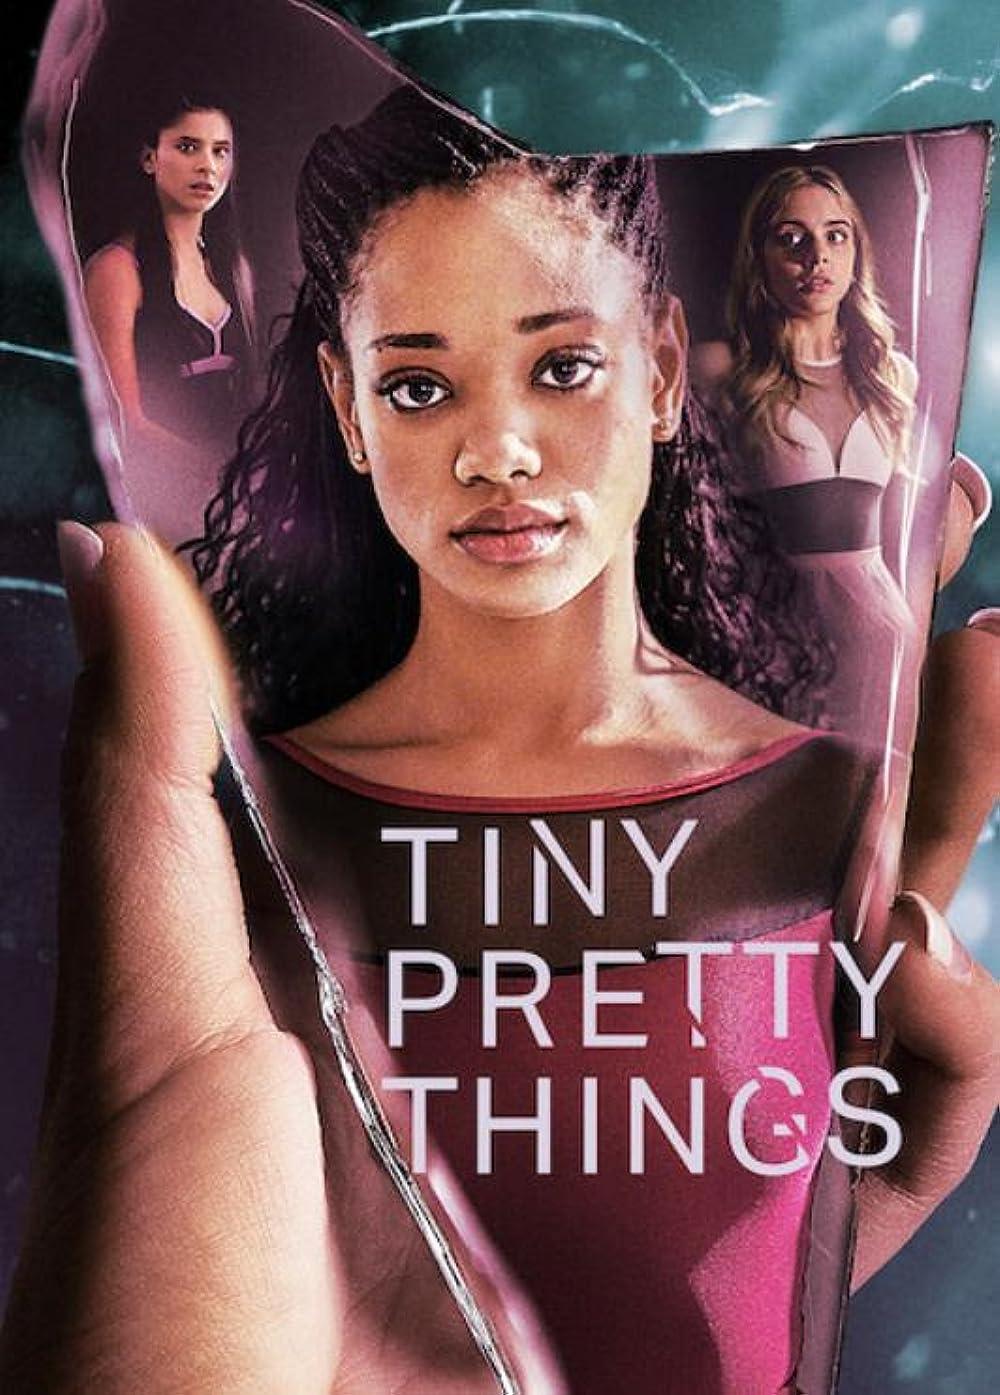 Tiny Pretty Things S01 2020 Hindi Complete Netflix Web Series 1750MB HDRip Download